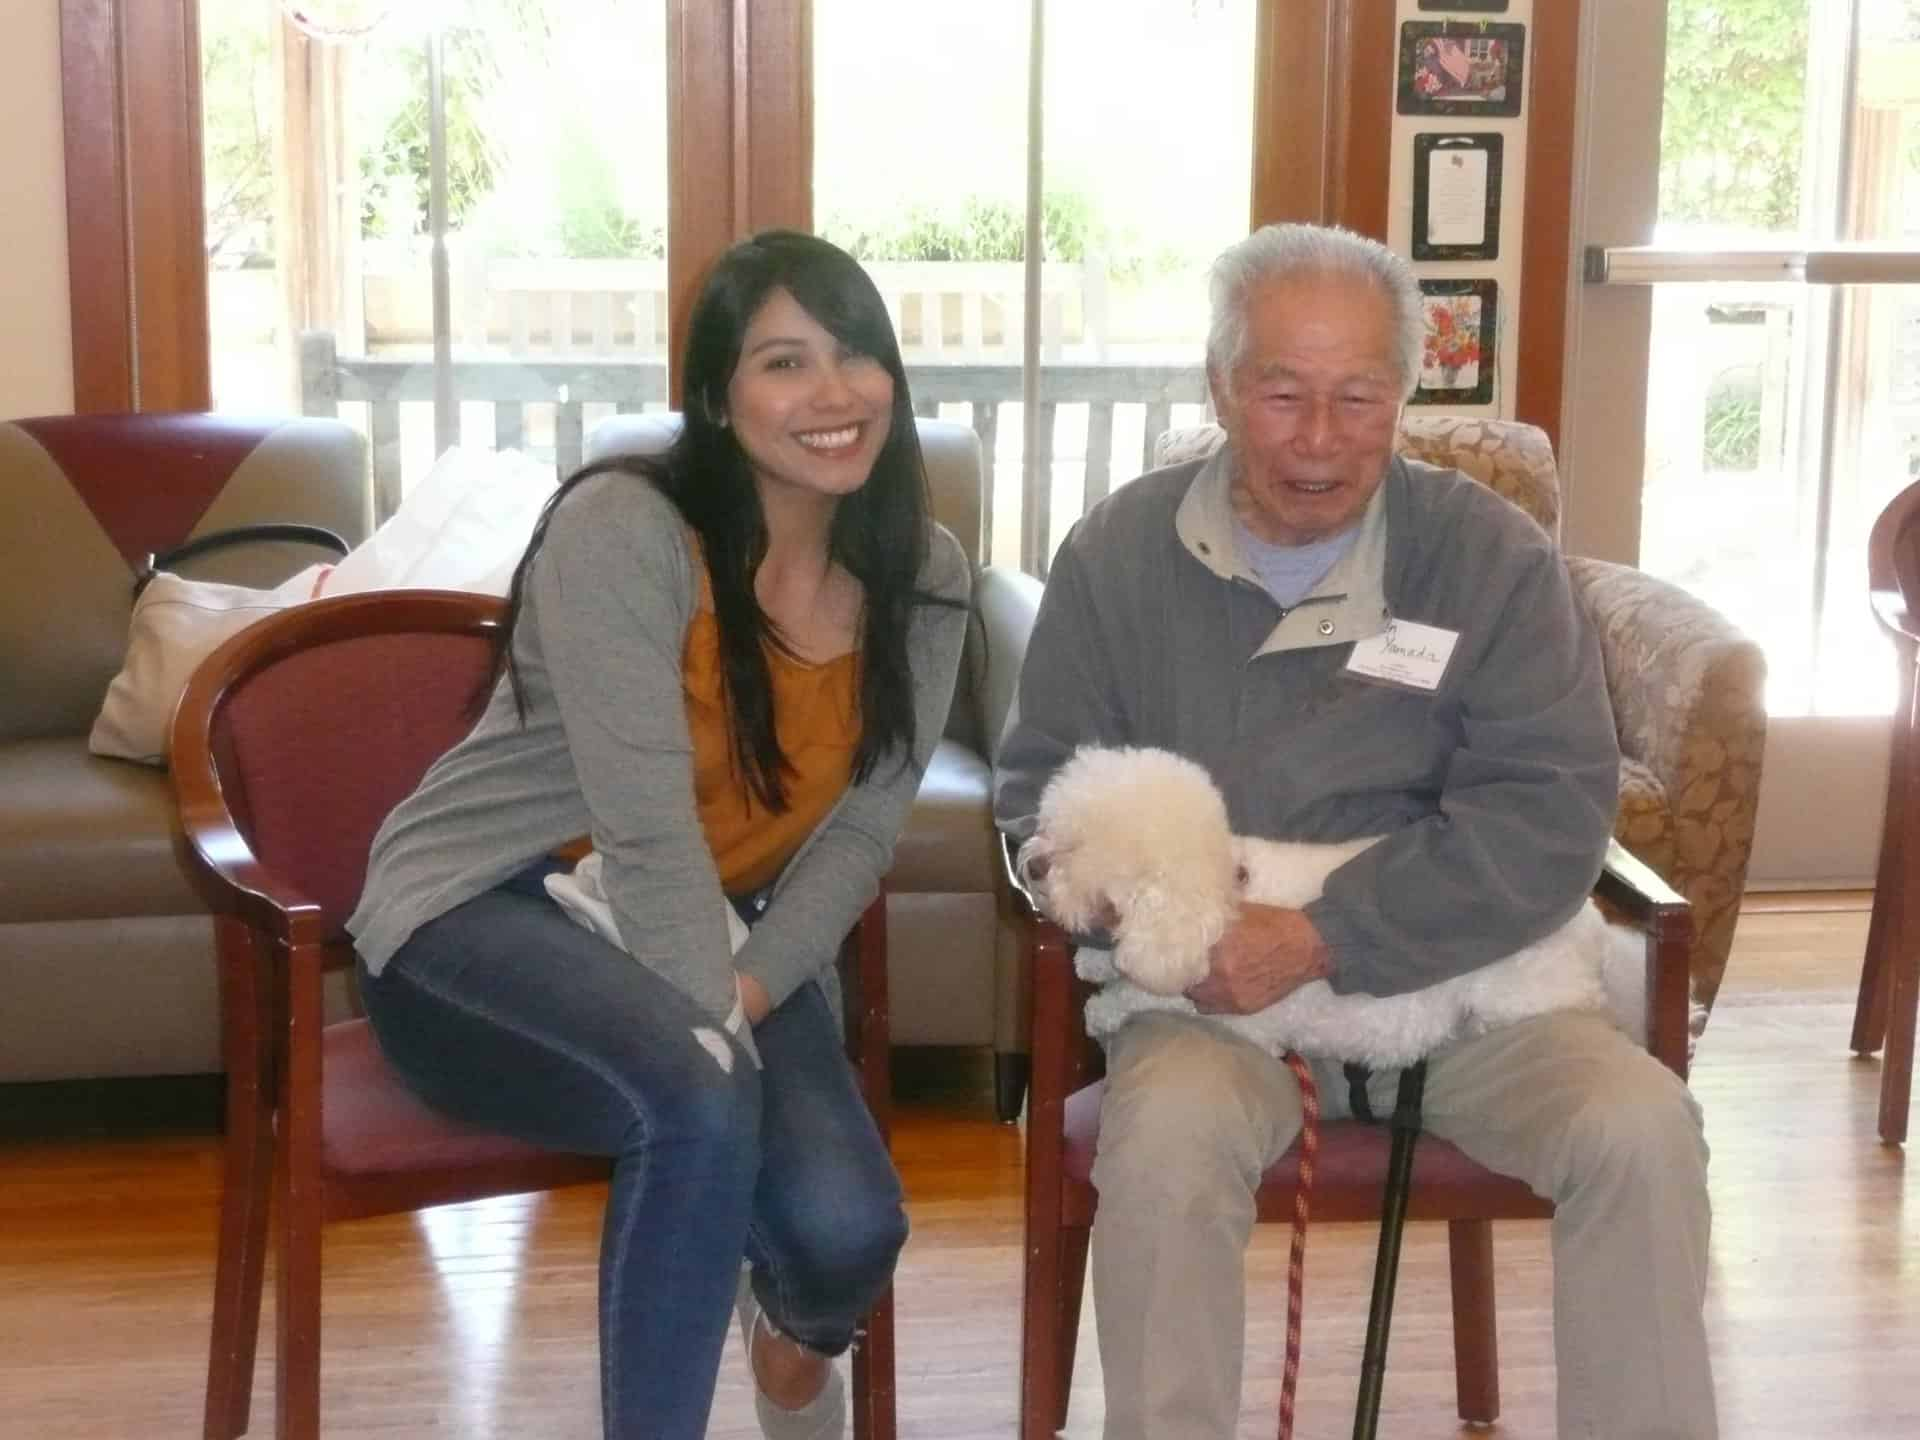 Arlene Esquivias and her therapy dog Minnie visit Avenidas